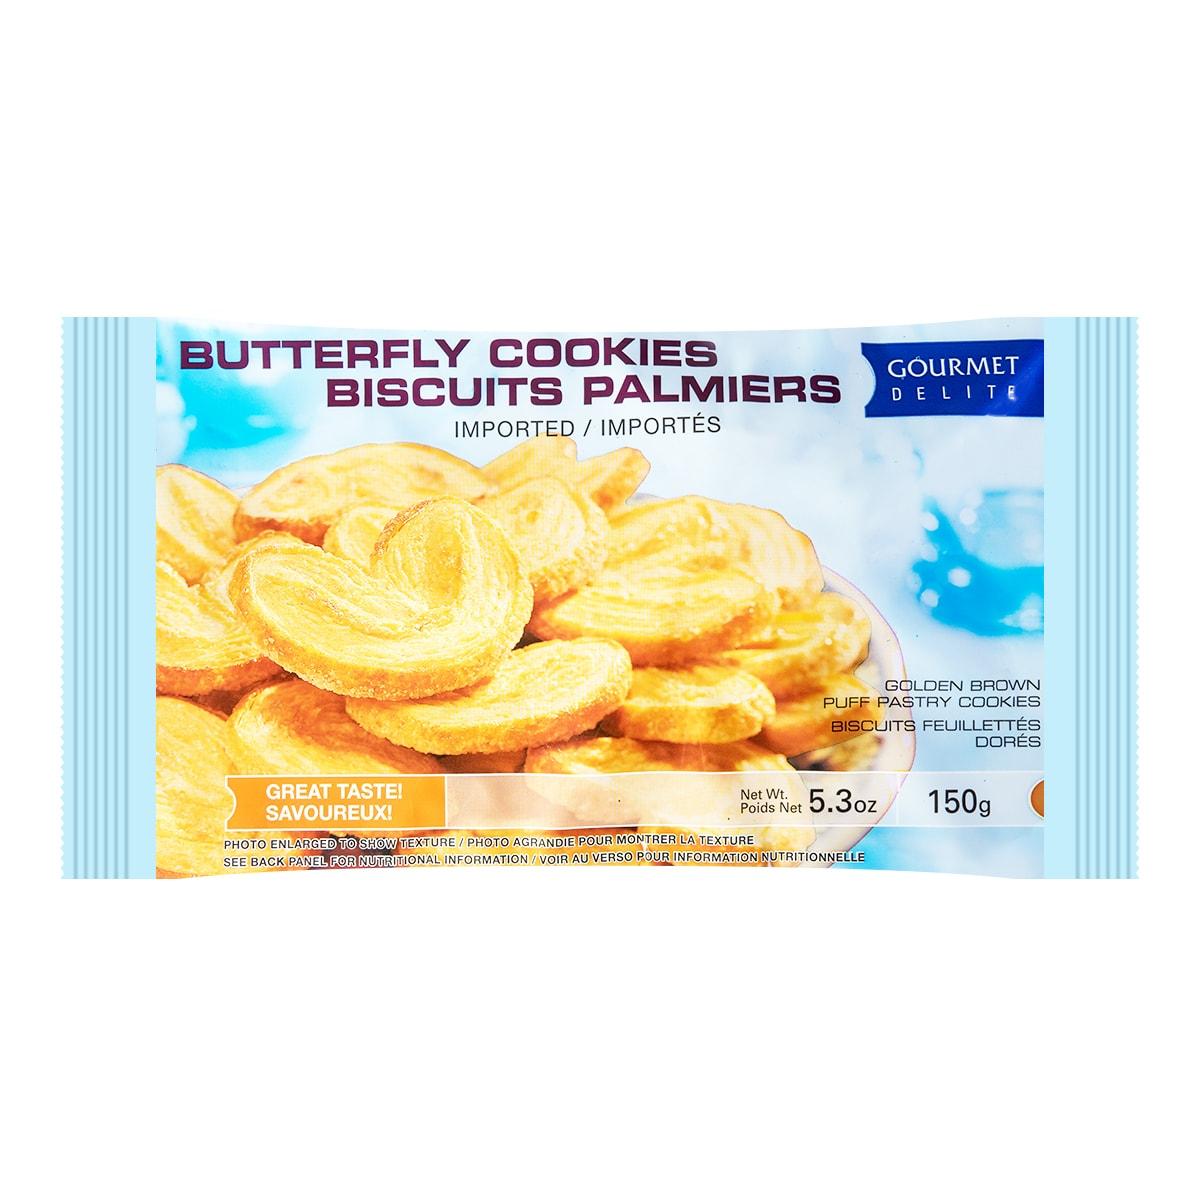 GOURMET Butterfly Cookies 150g